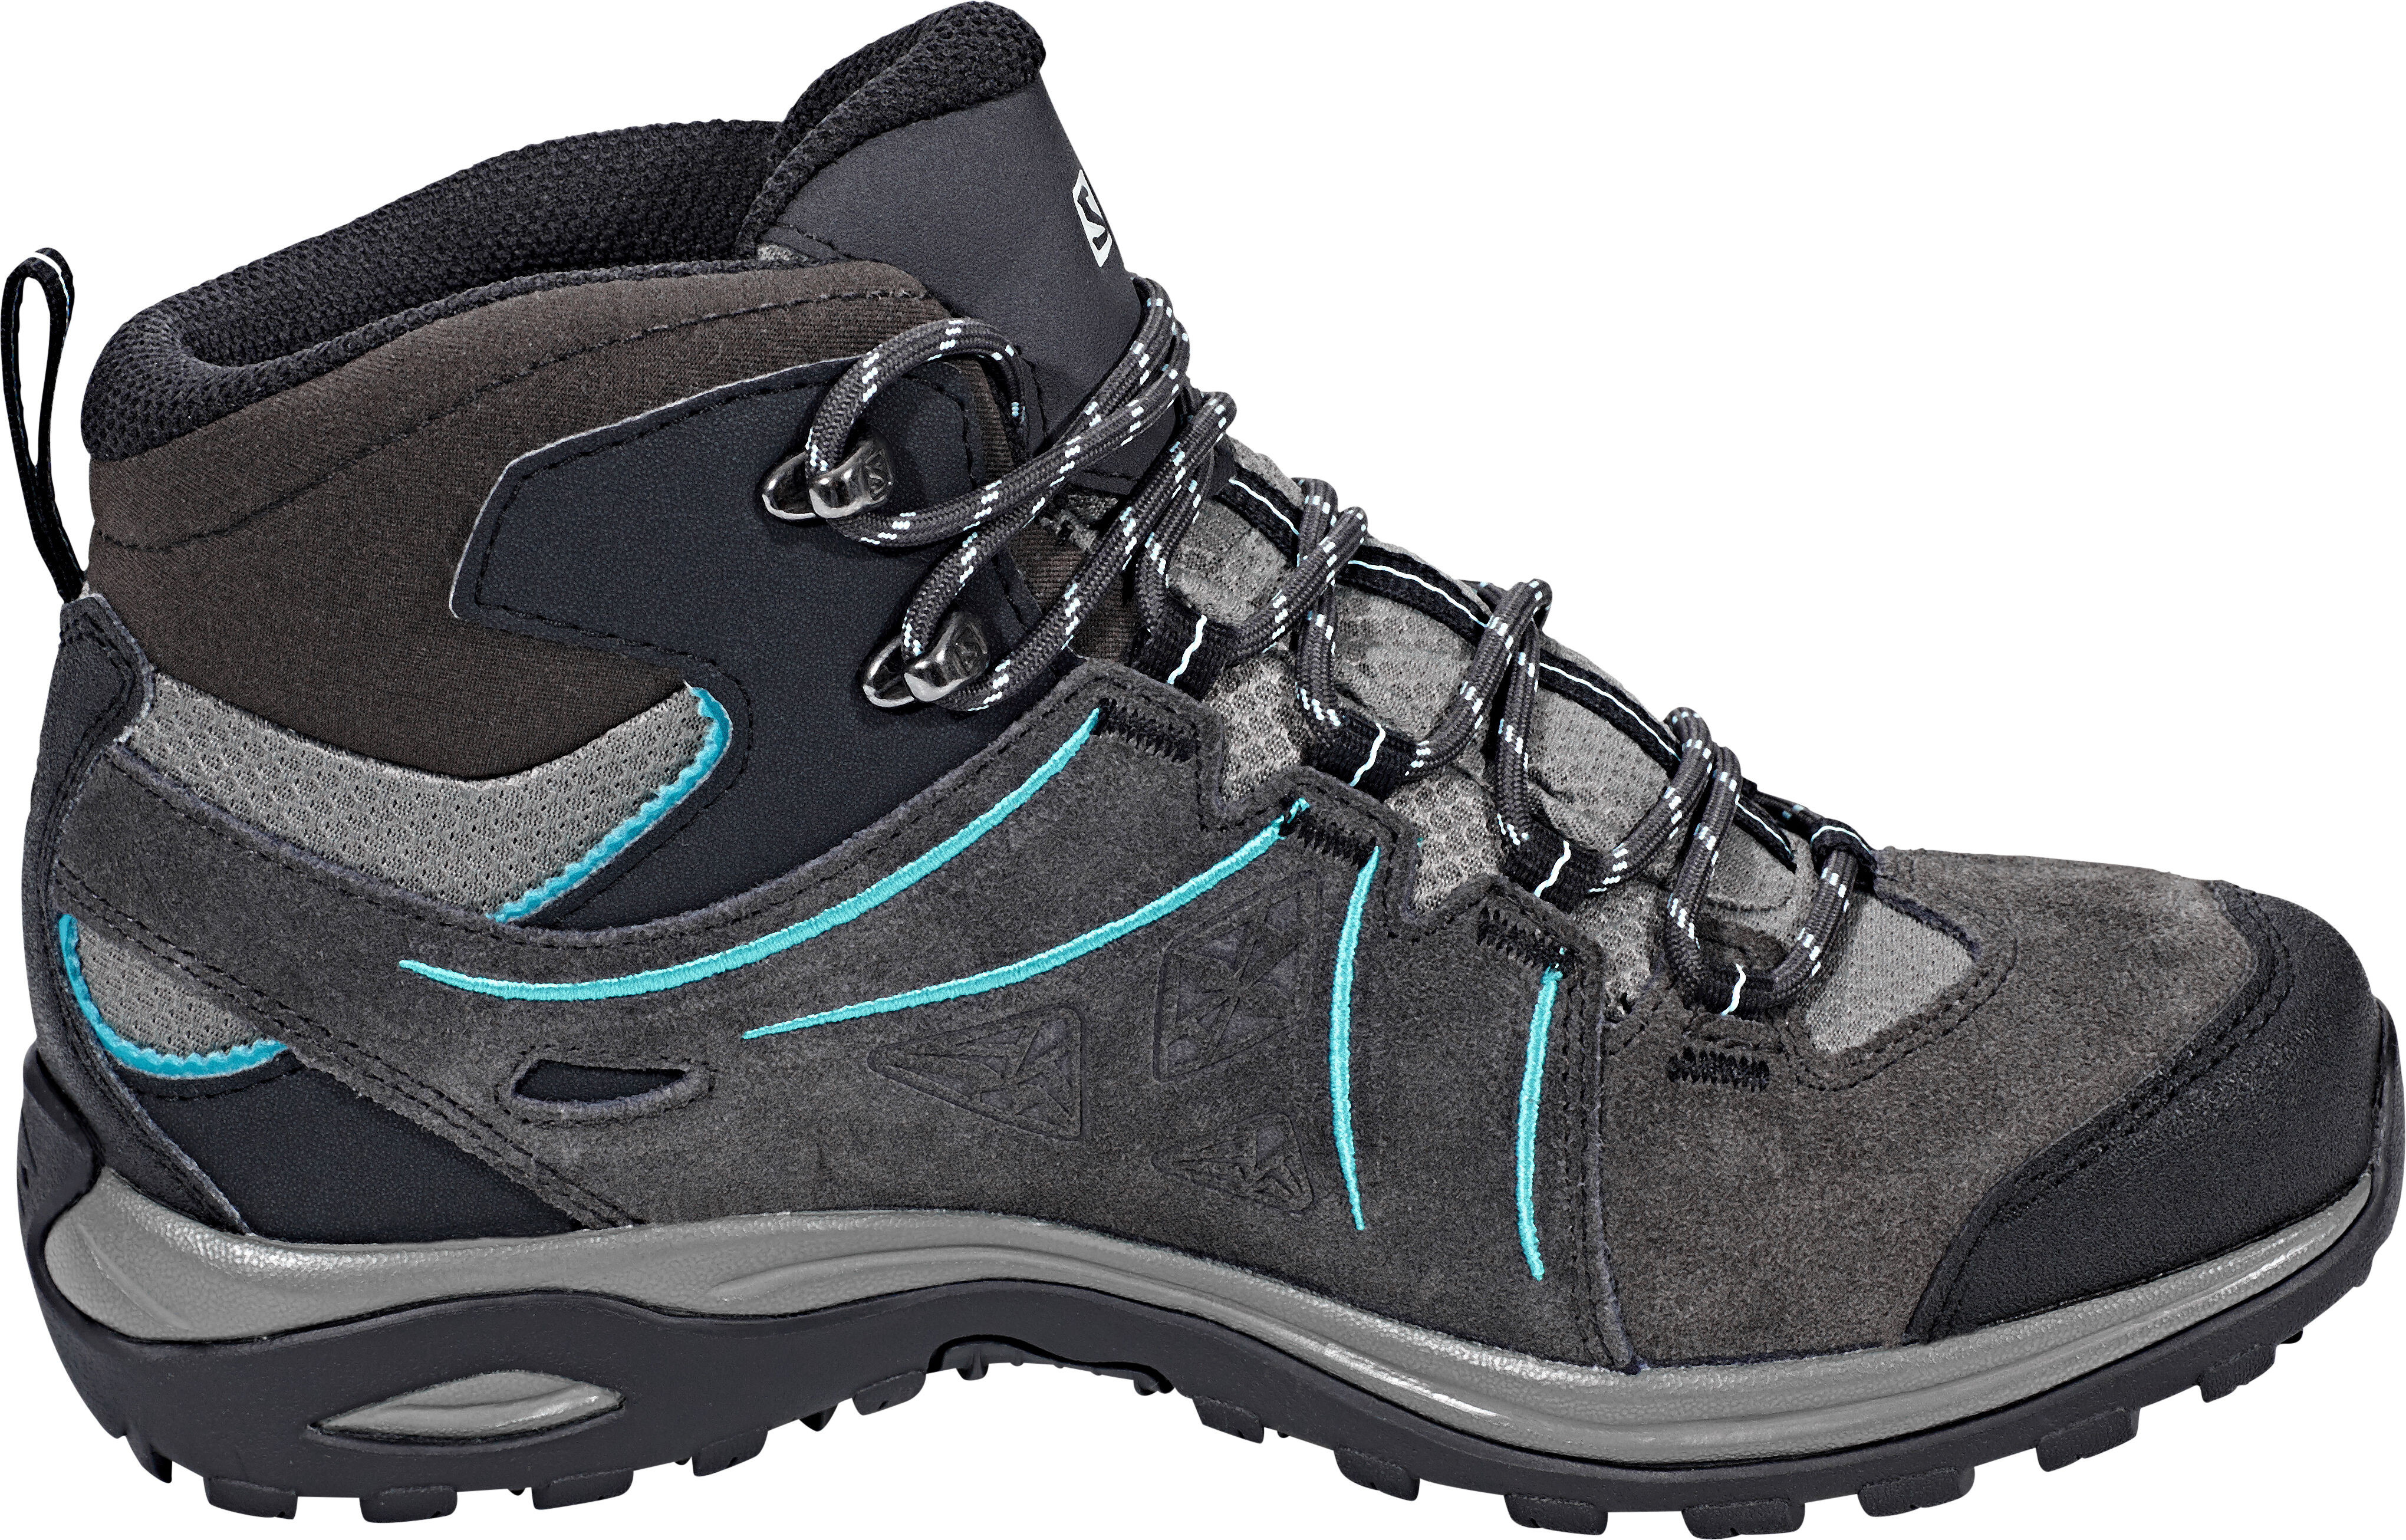 135dd2a7 Salomon Ellipse 2 Mid LTR GTX Shoes Women phantom/castor gray/aruba blue